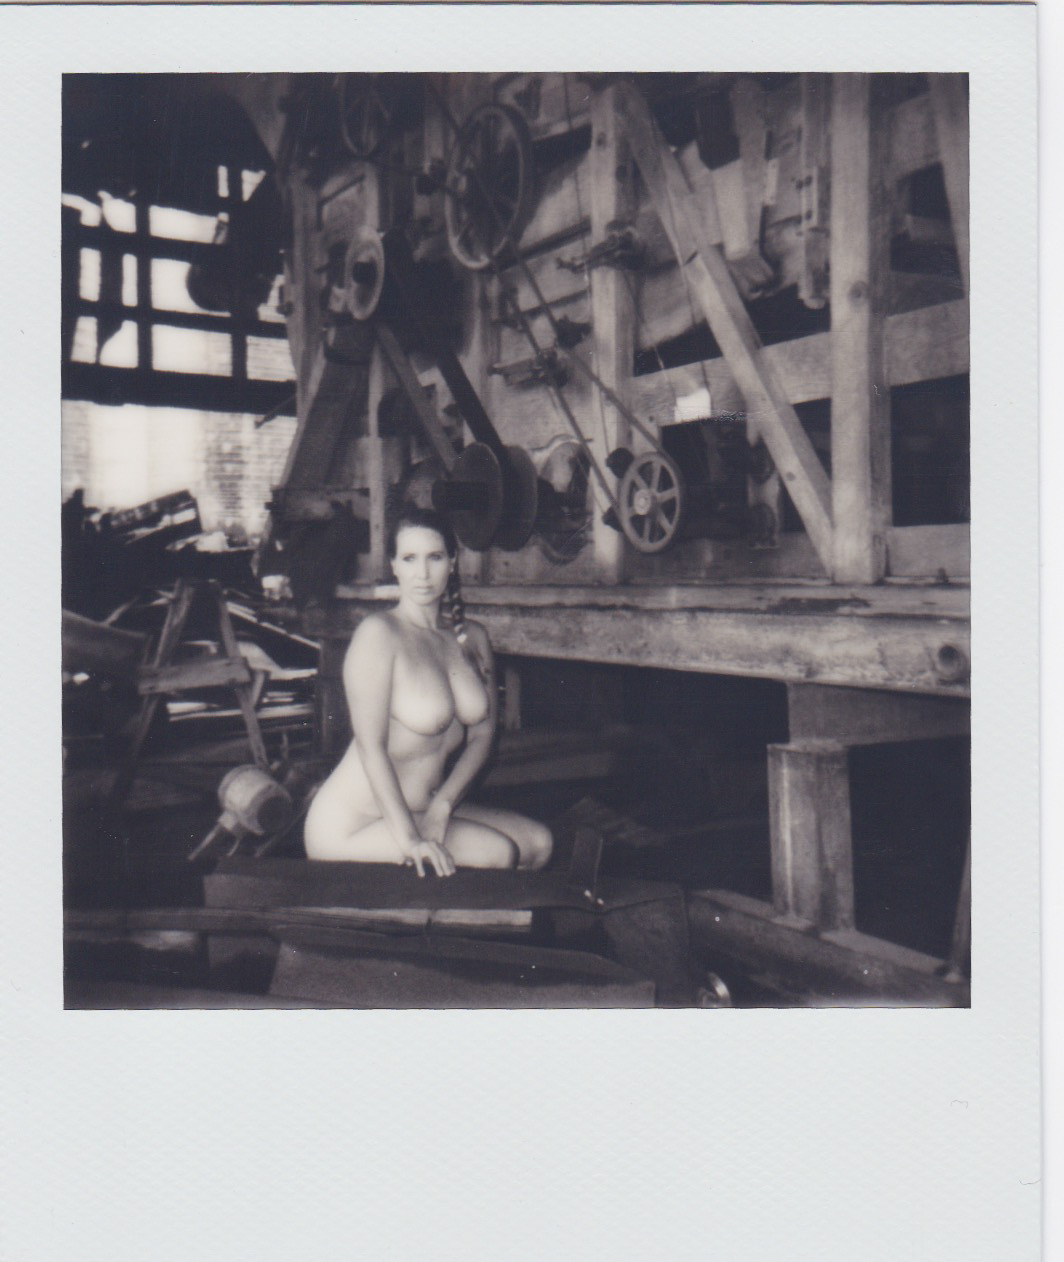 Polaroid project Day 1-1 by JW Purdy